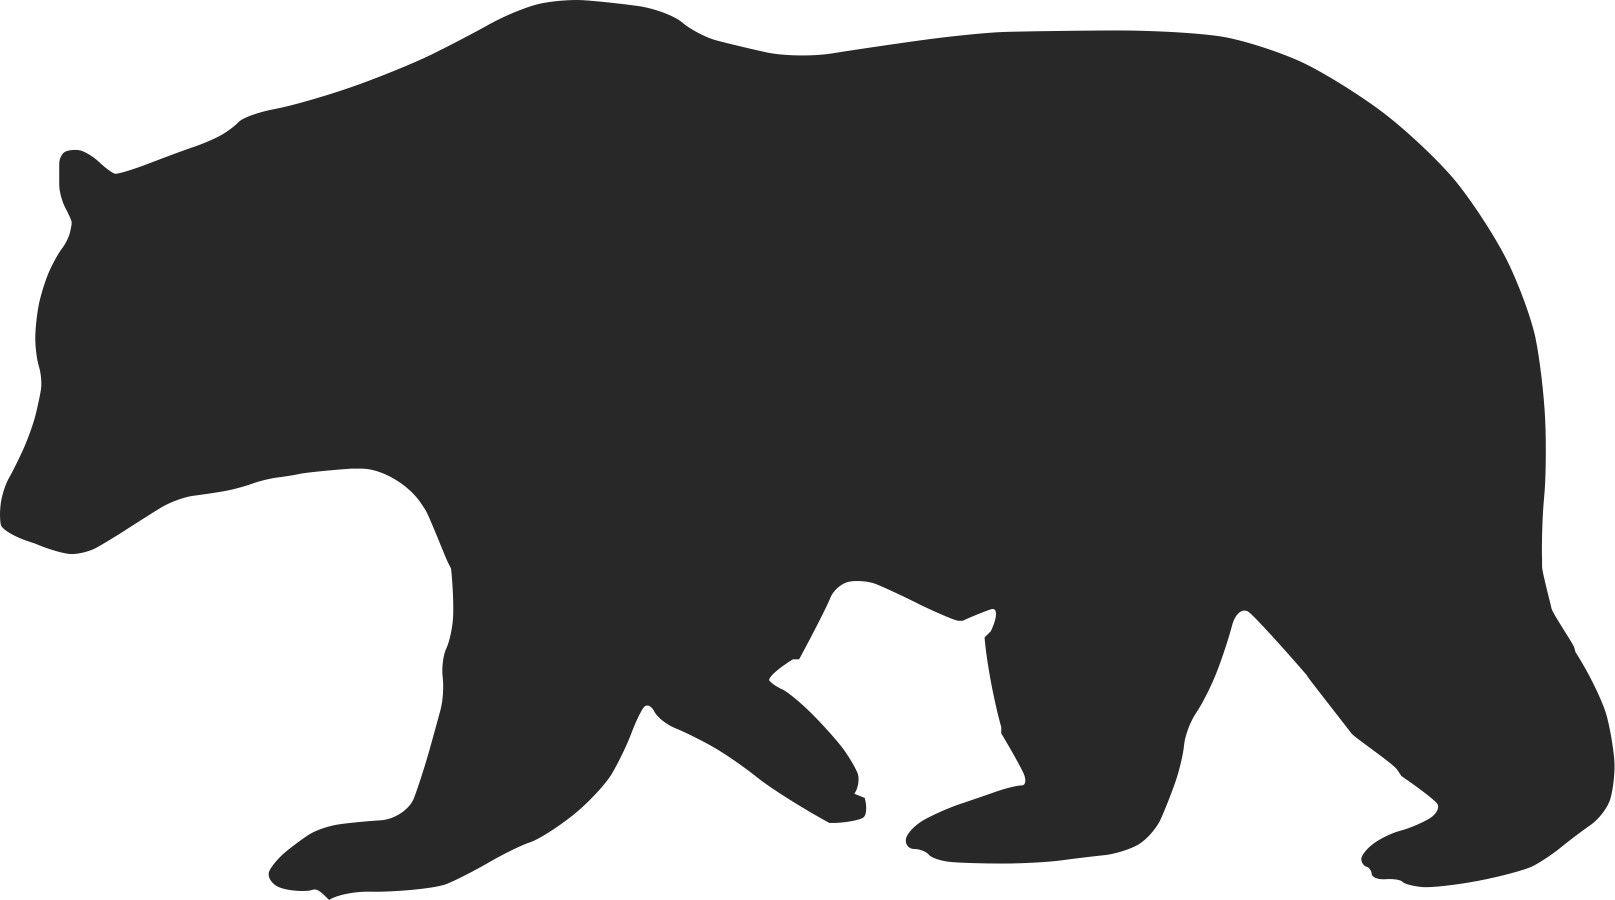 black bear silhouette clip art at getdrawings com free for rh getdrawings com black bear clip art pictures black bear clip art images